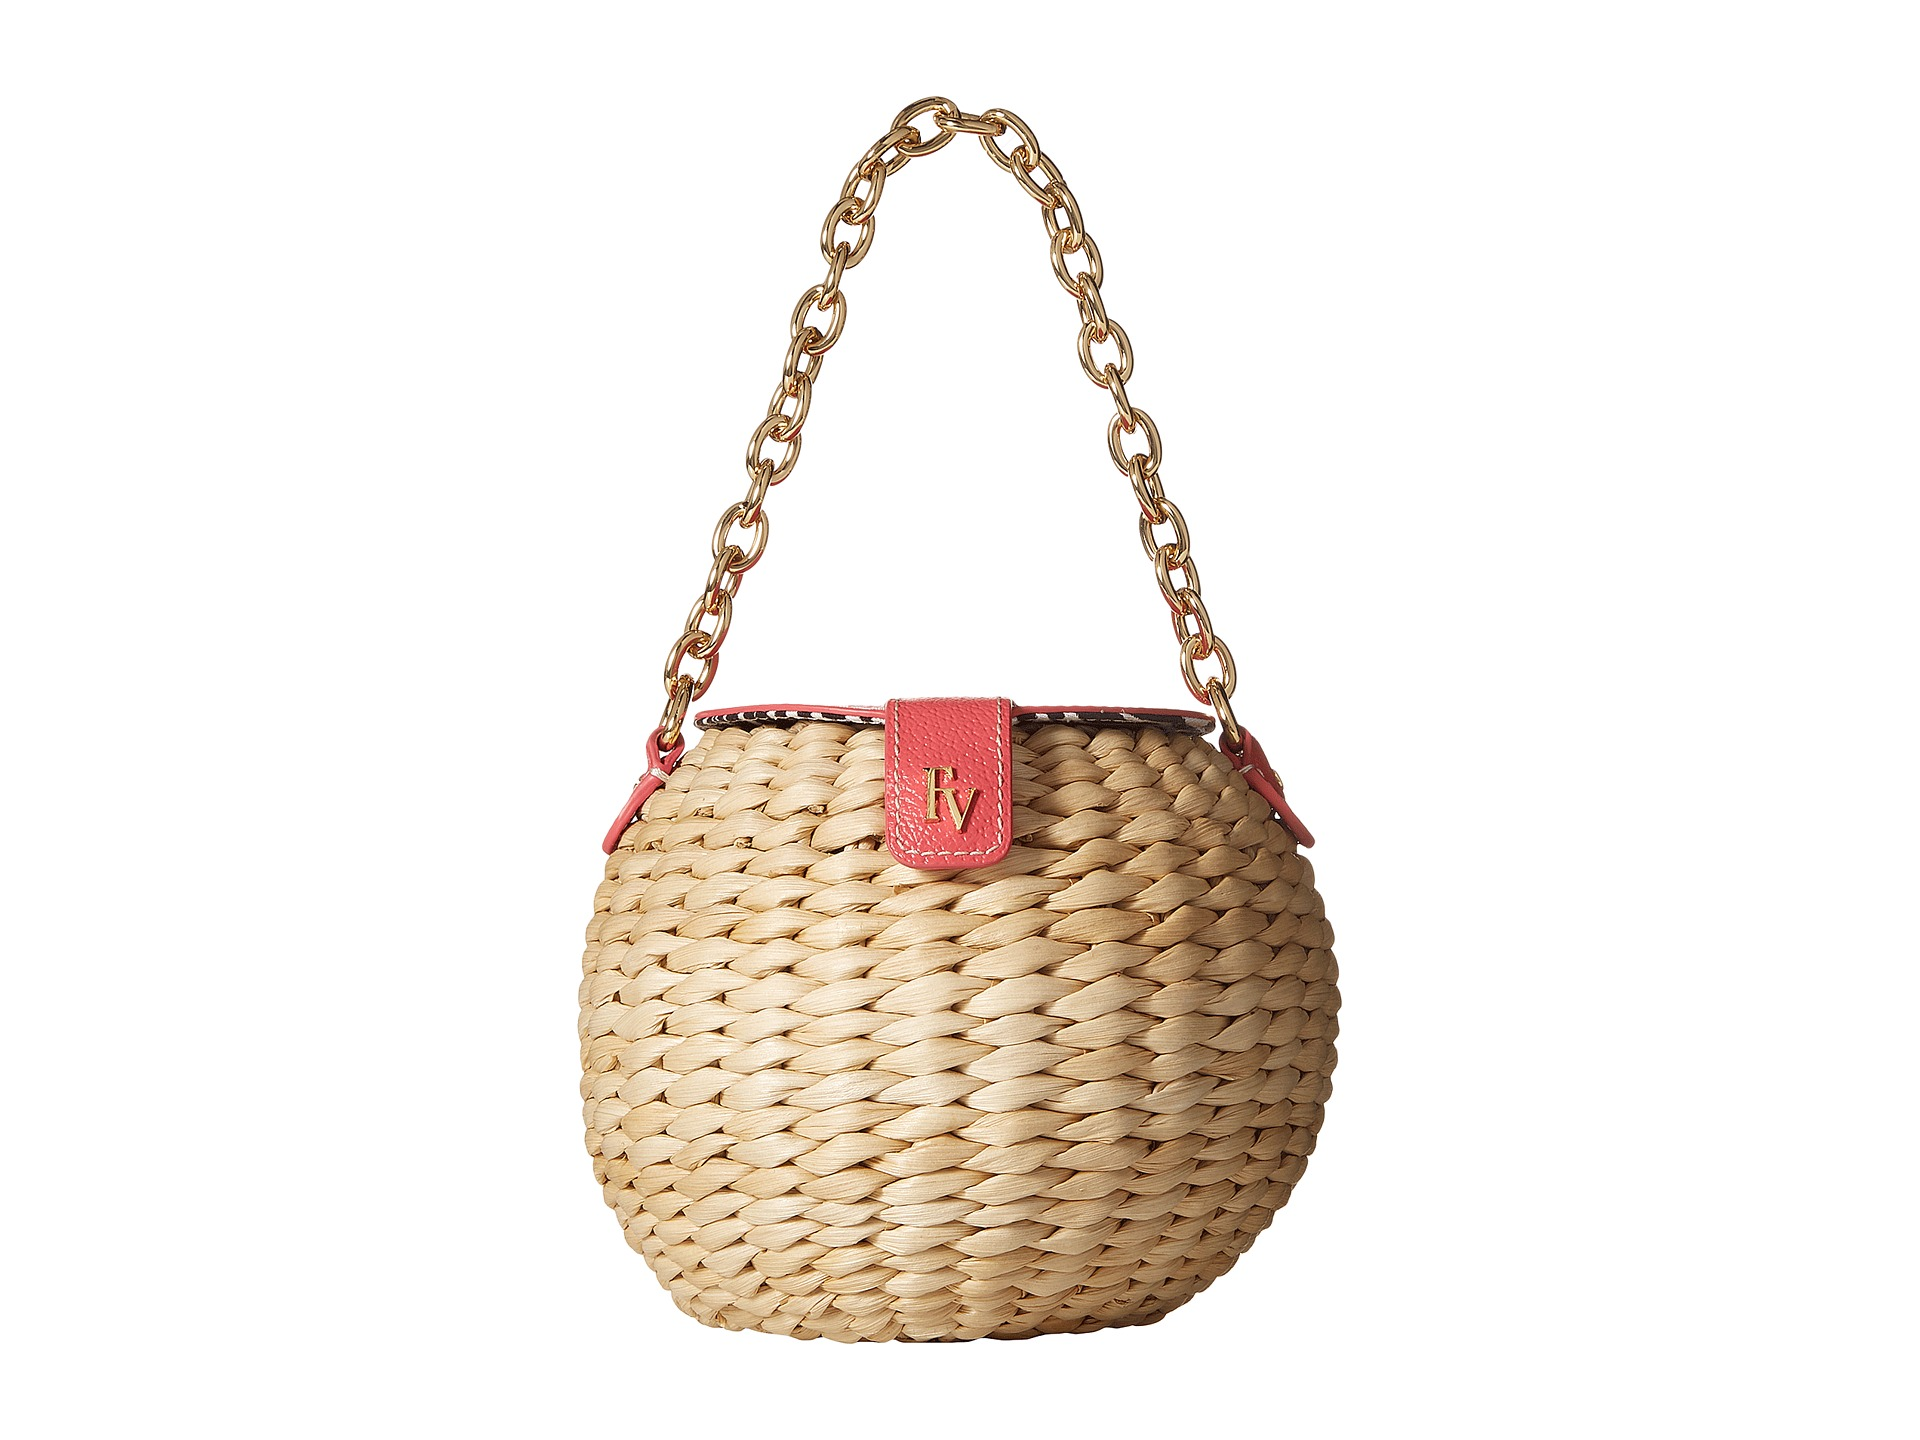 Frances Valentine Honey Pot Woven Bucket Bag